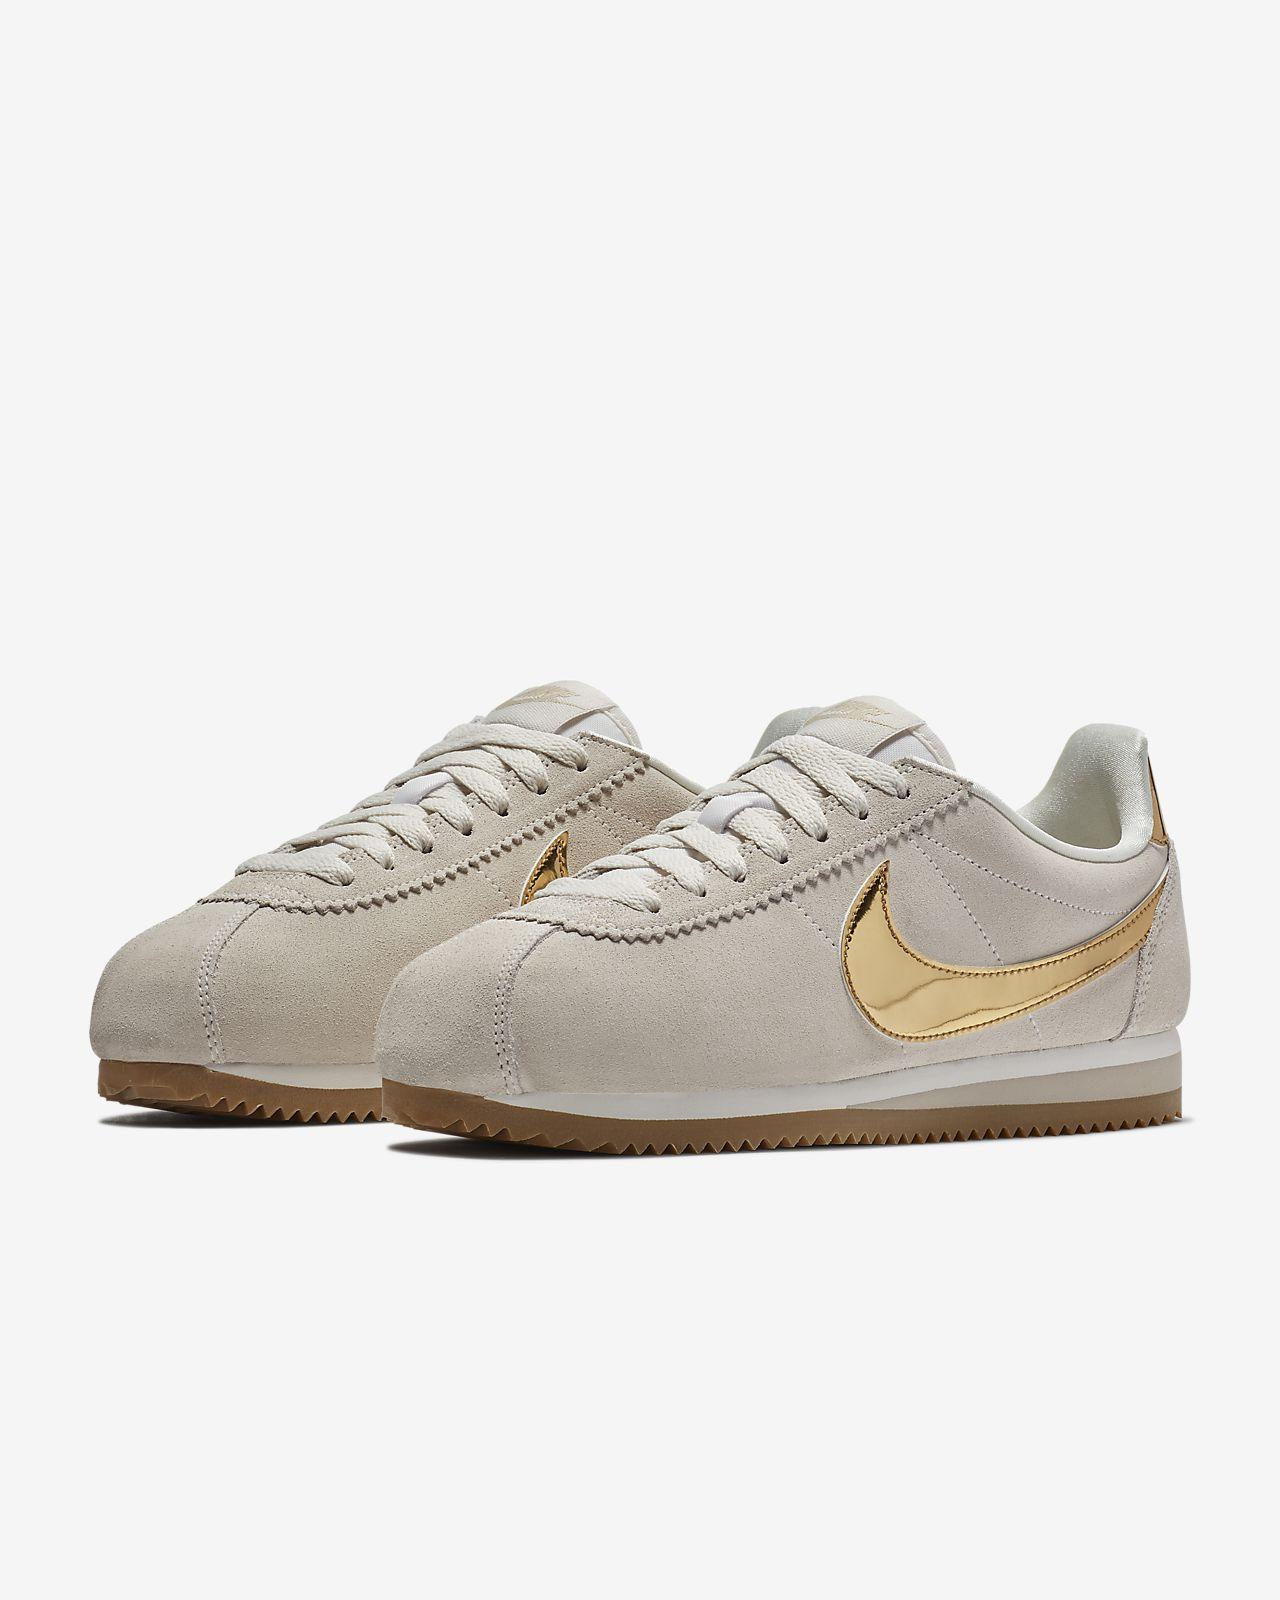 timeless design 4618c 2f266 ... Nike Cortez SE Women s Shoe